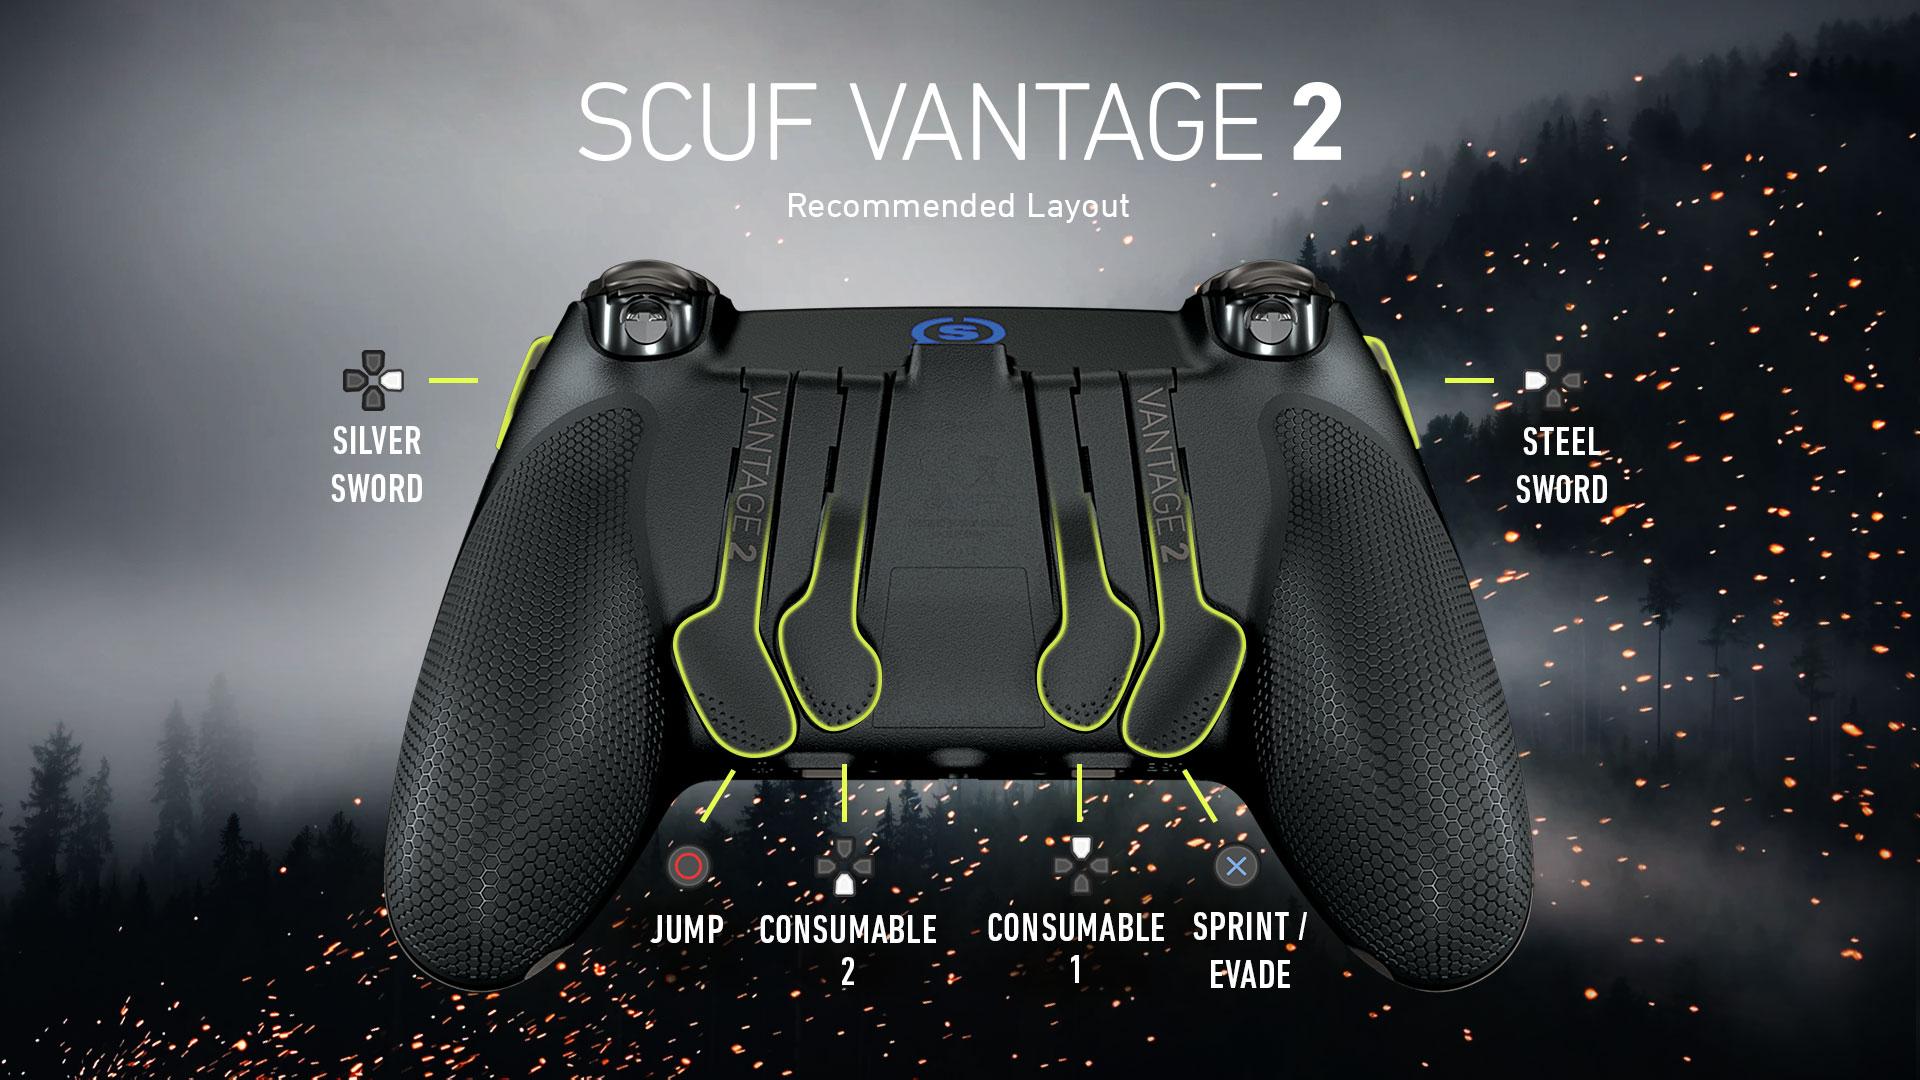 SCUF Vantage 2 Witcher 3 Controller Configuration